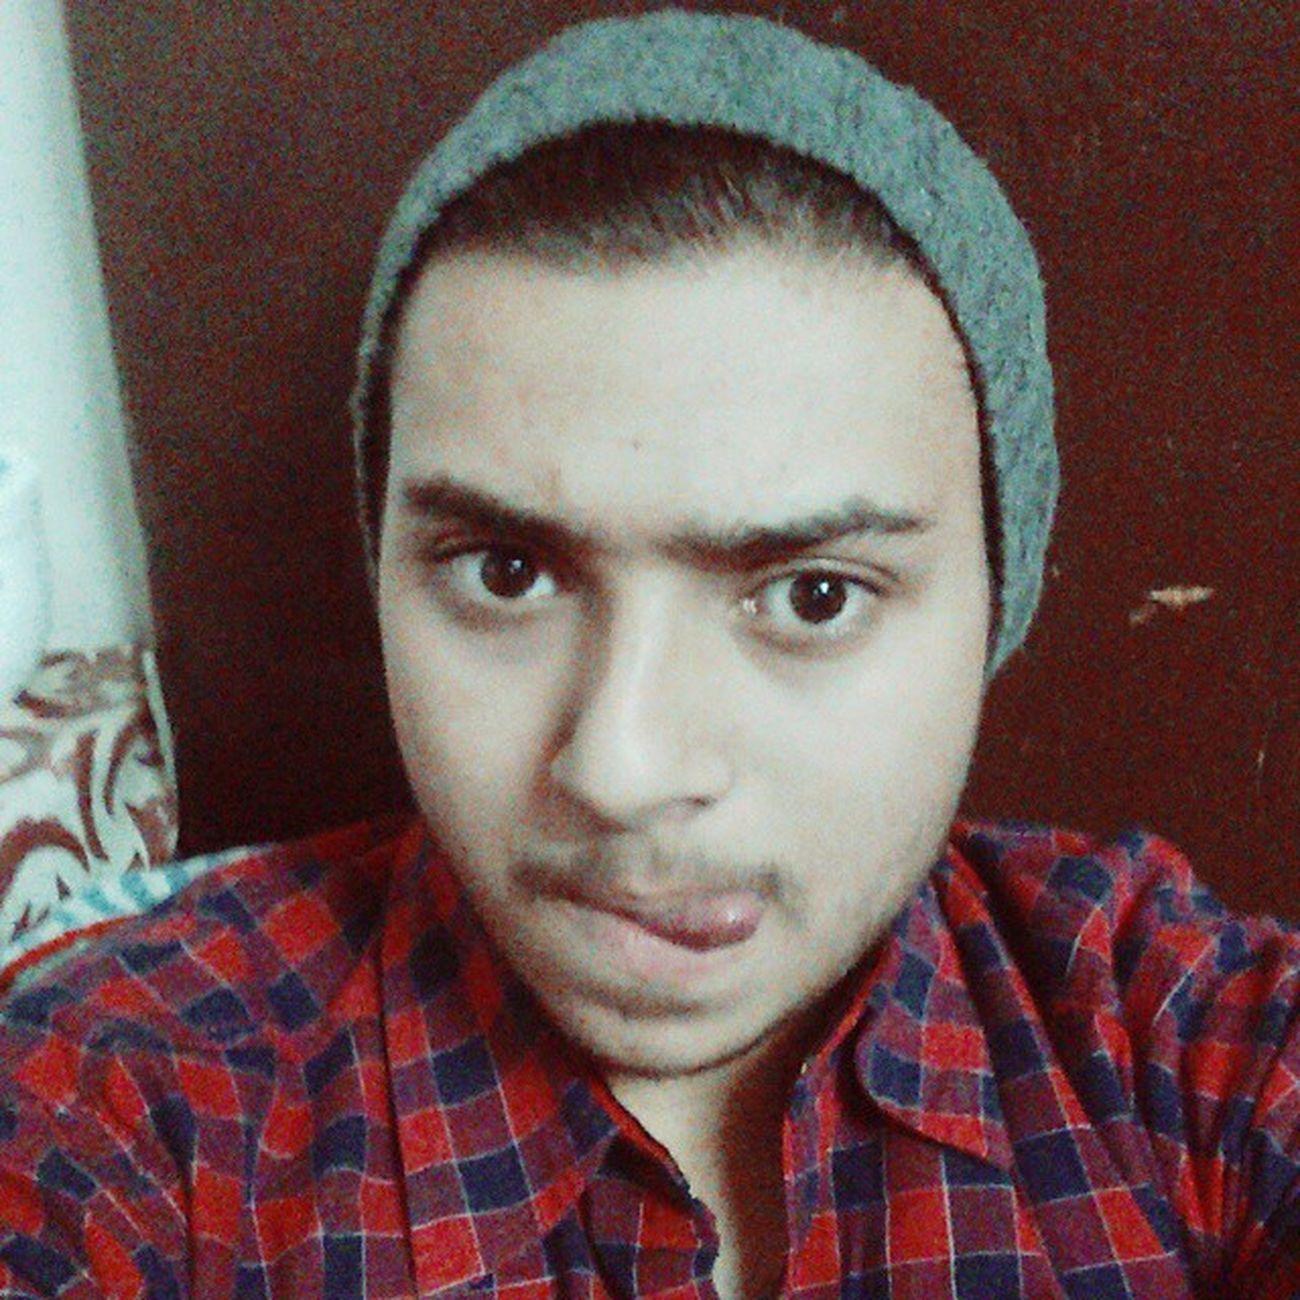 Merryxmas Thand Instapic Selfieeee Haha